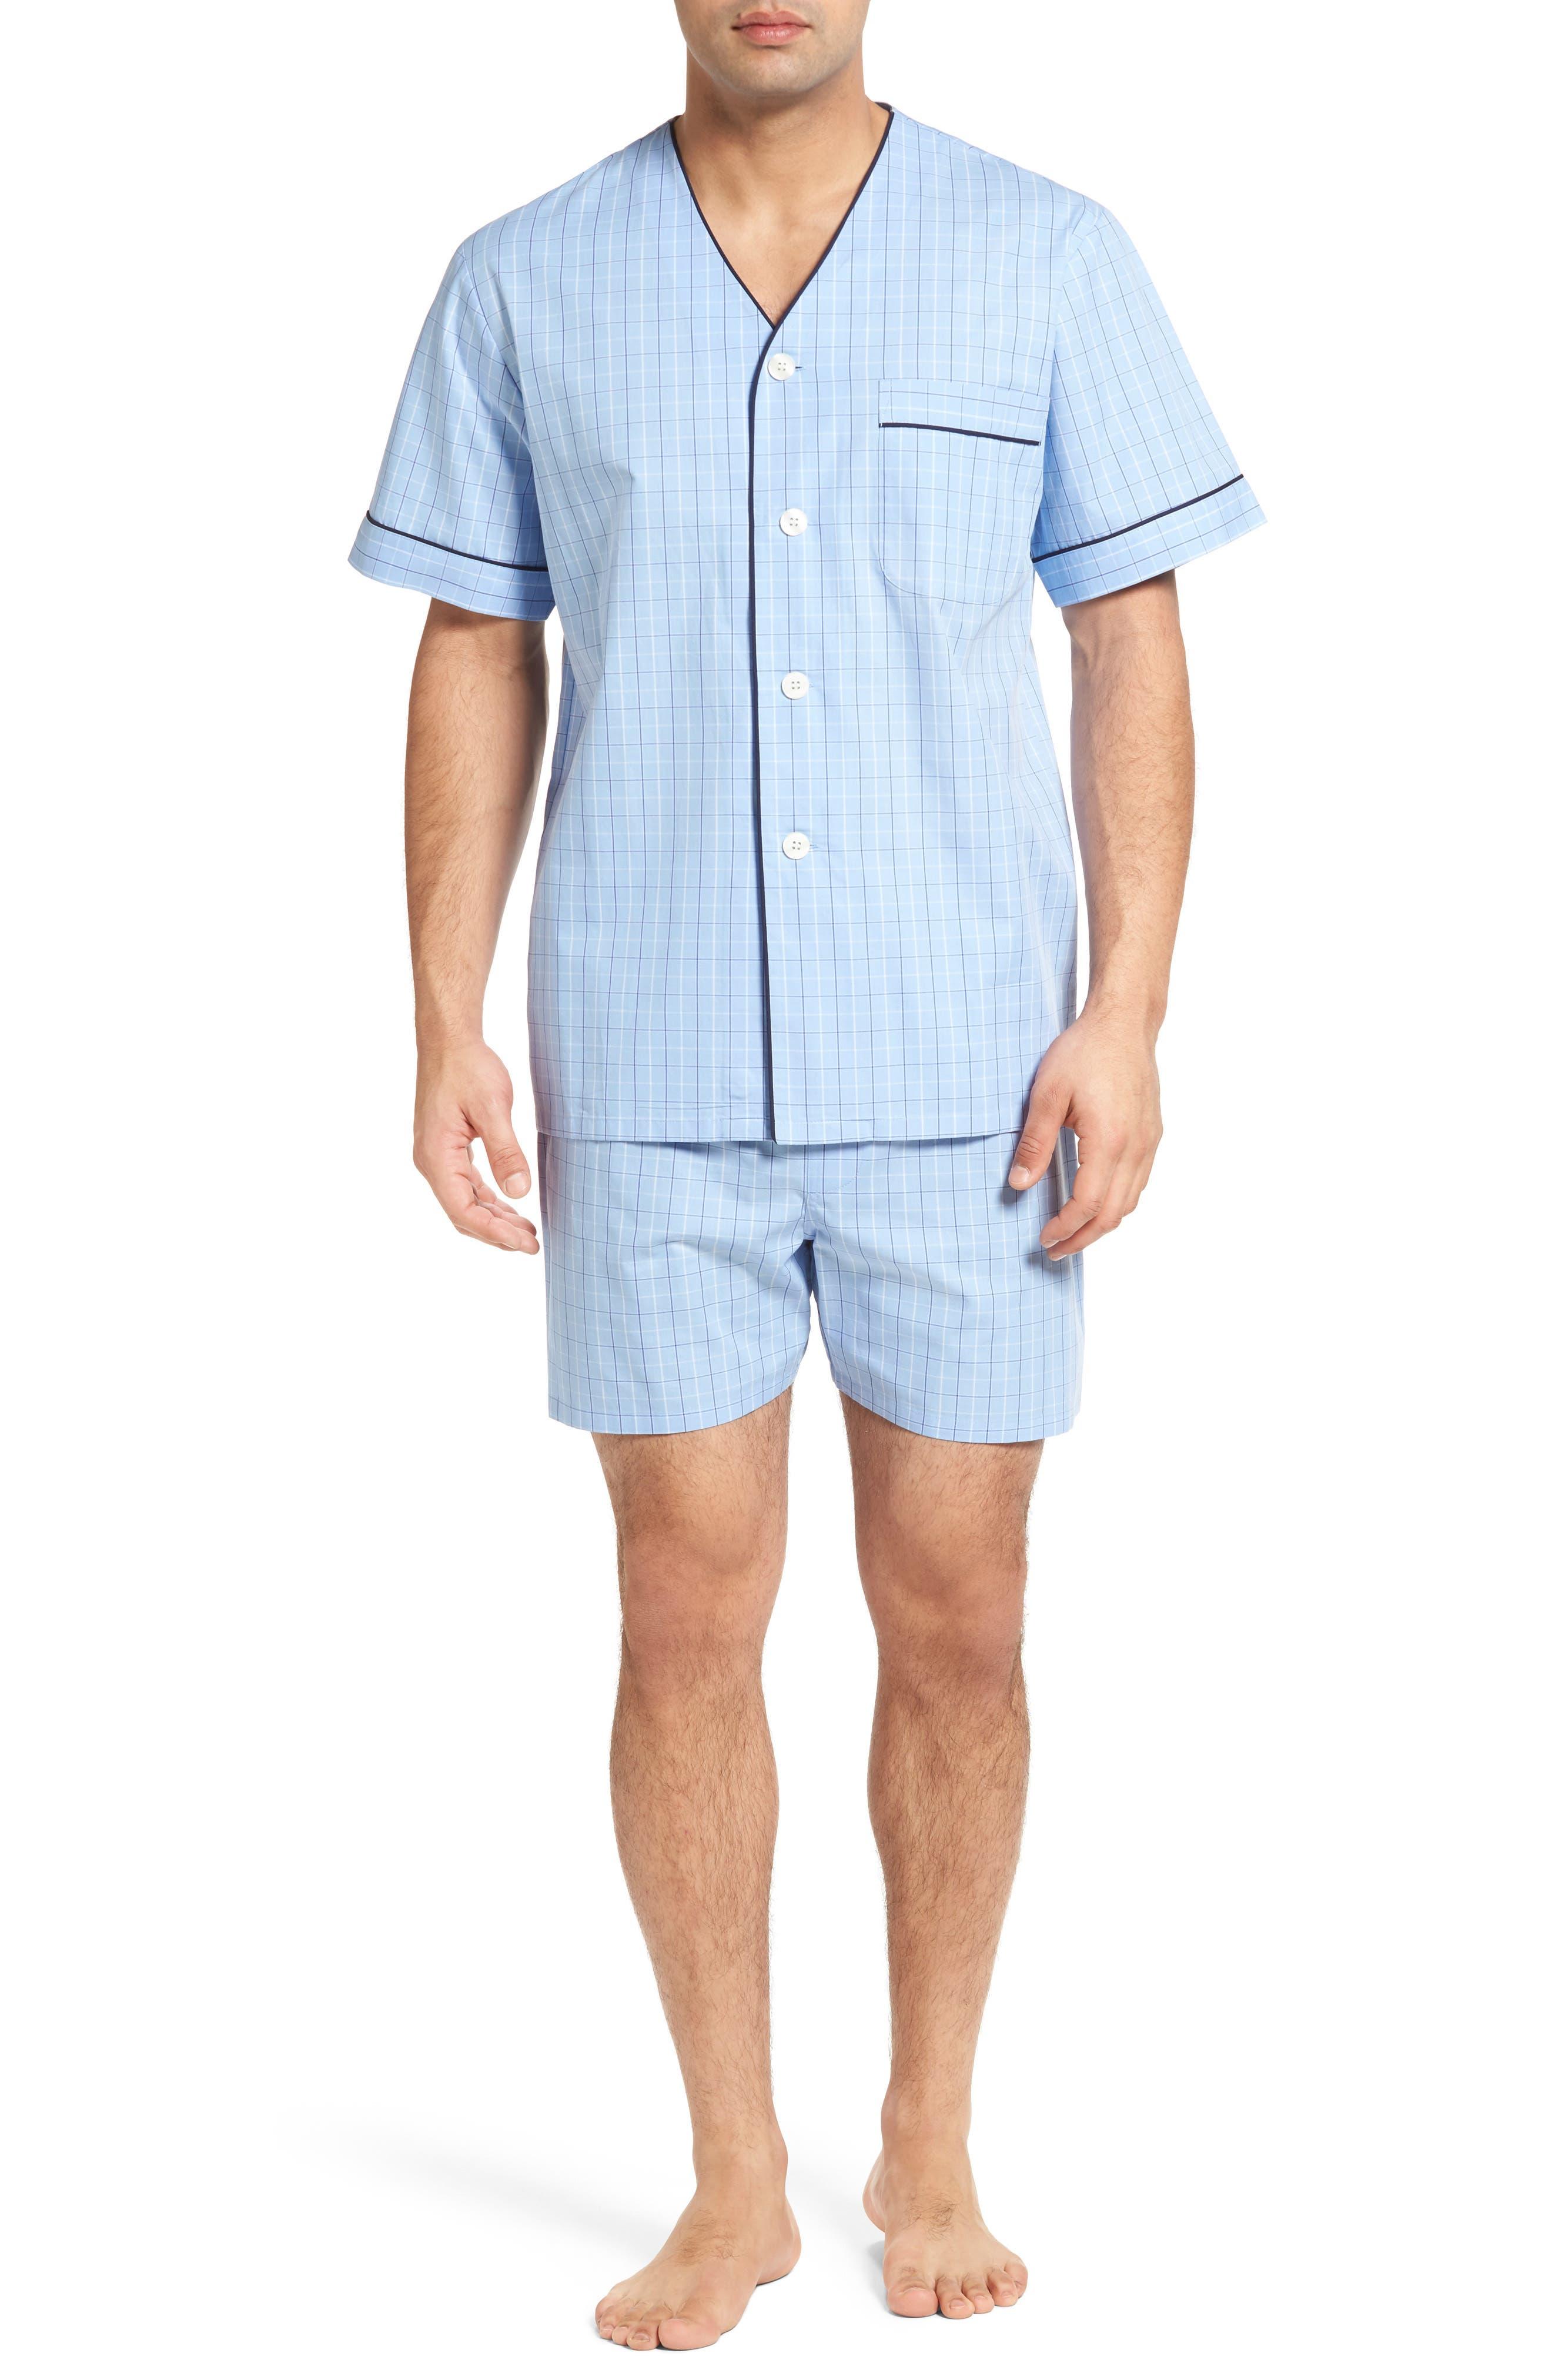 Cotton Short Pajamas,                             Main thumbnail 1, color,                             Light Blue Check